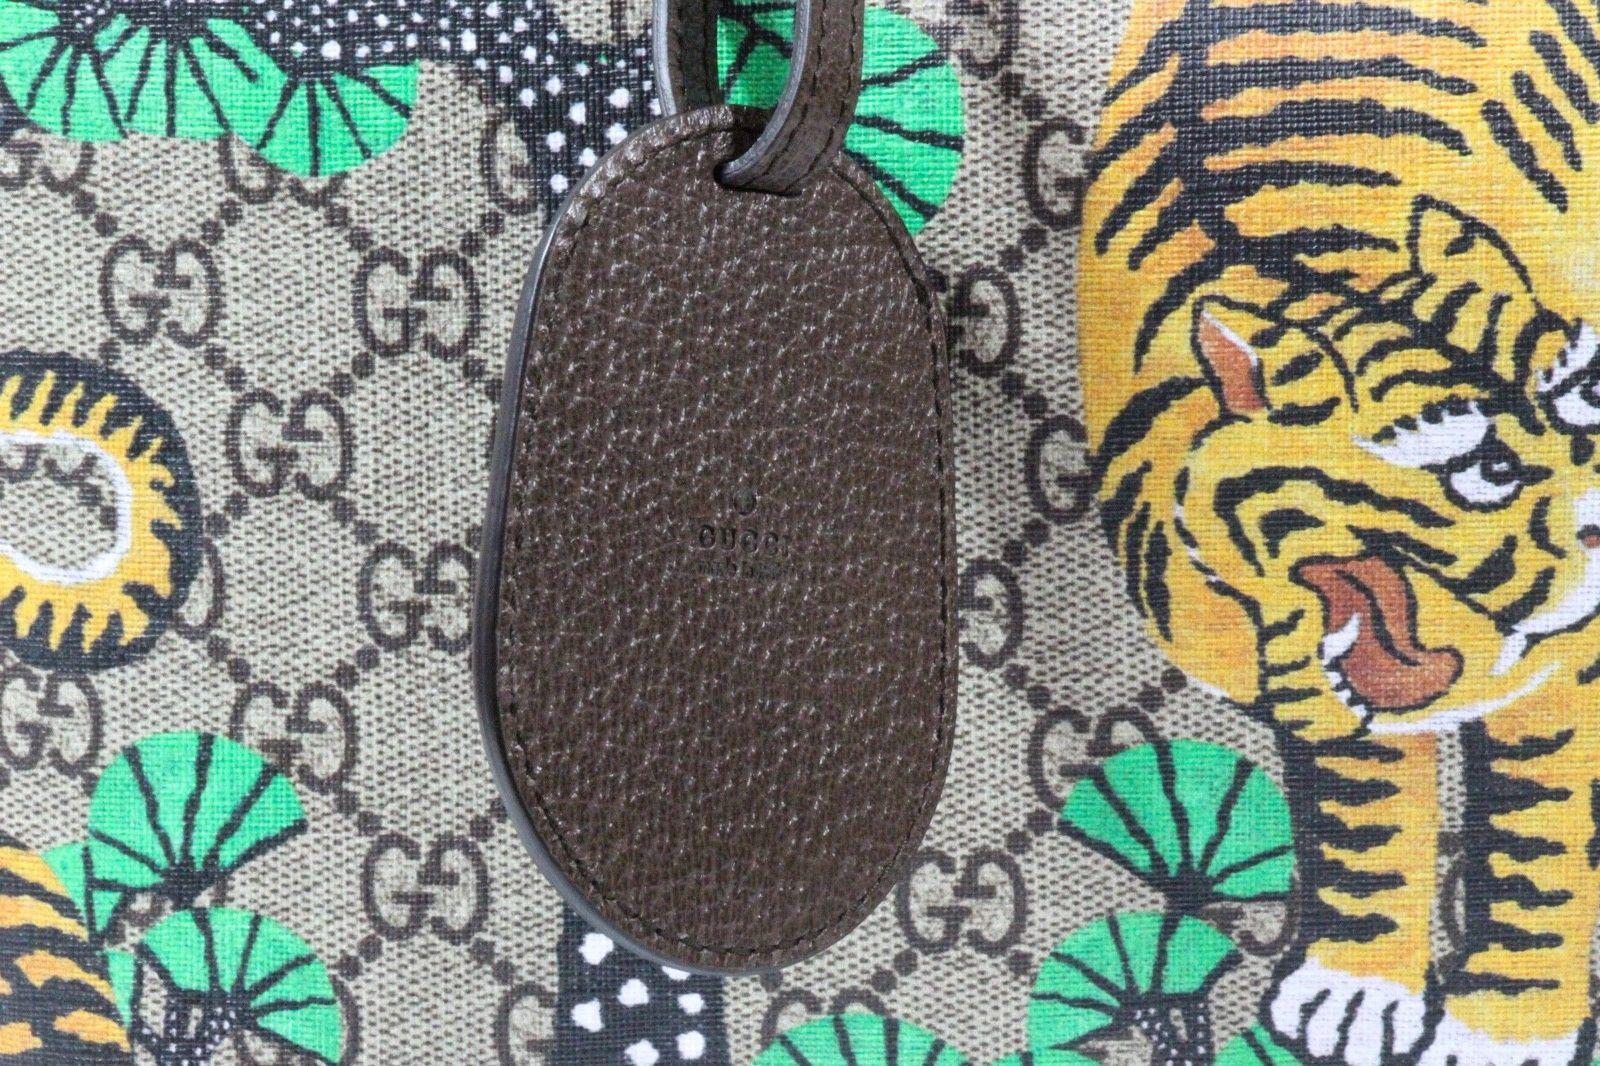 60df11b9e93 NWT GUCCI 412096 Bengal GG Supreme Tote Bag